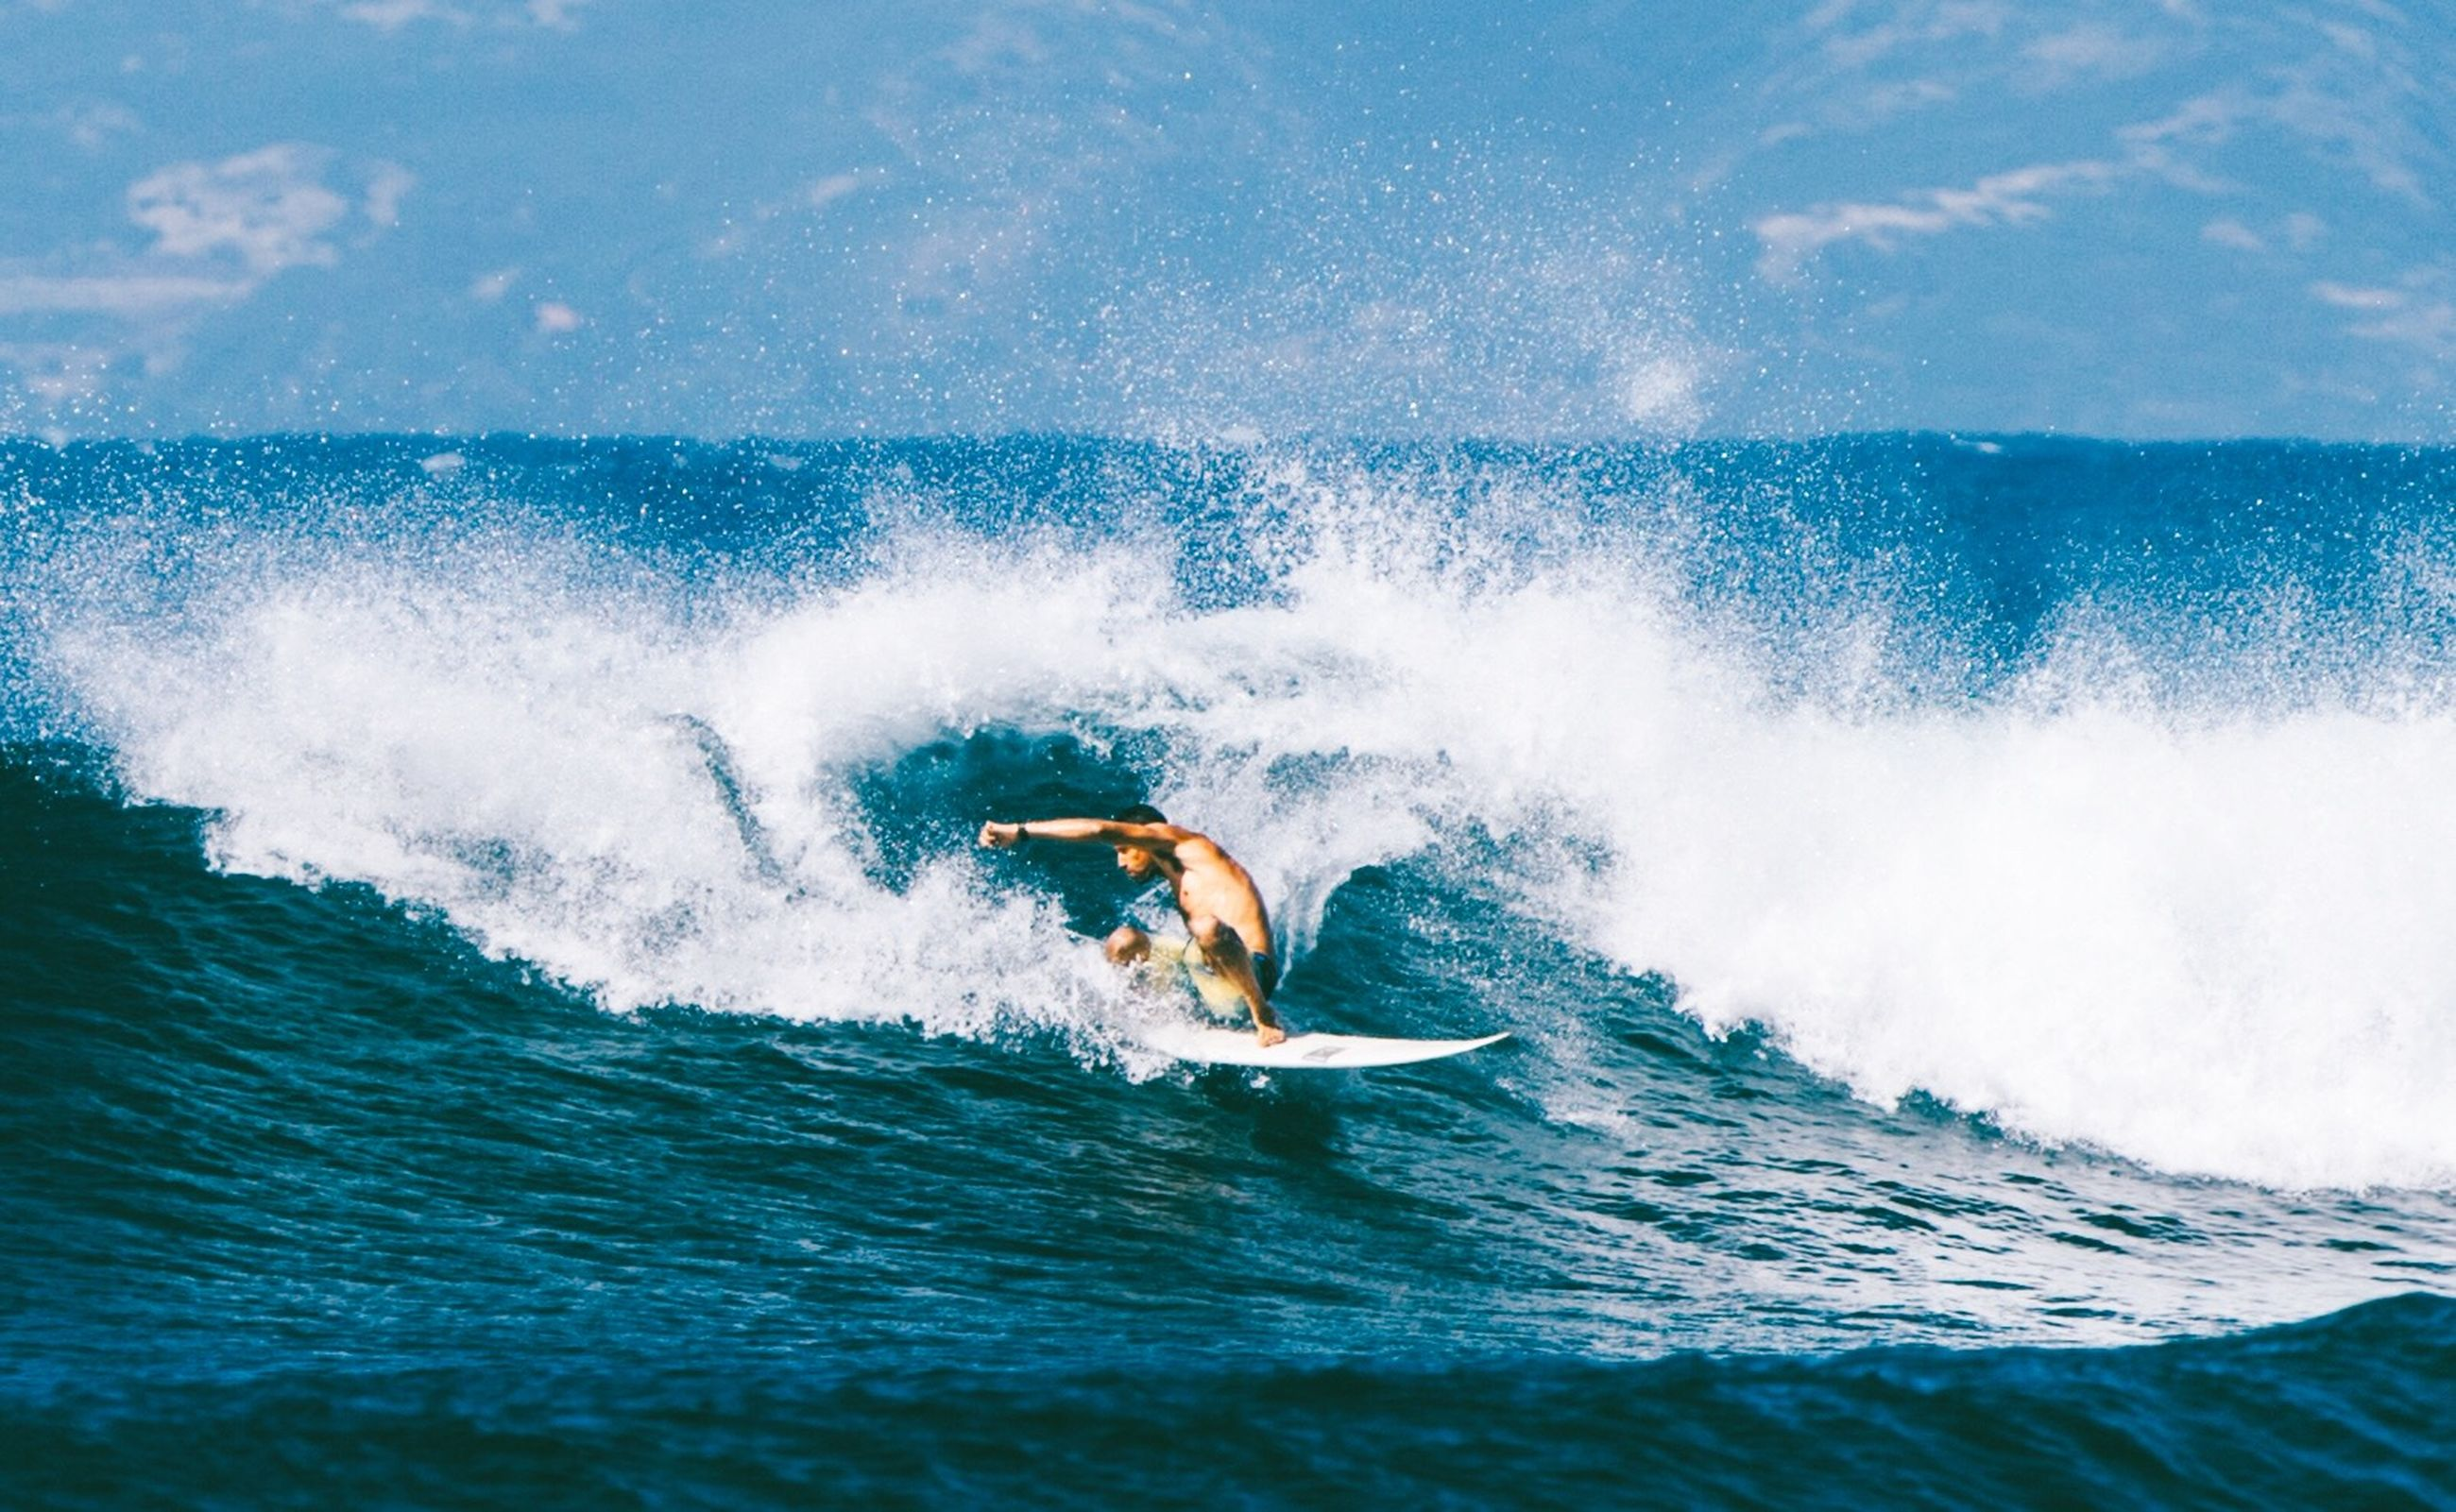 water, sea, waterfront, wave, leisure activity, motion, splashing, lifestyles, surfing, blue, surf, men, swimming, adventure, vacations, surfboard, enjoyment, extreme sports